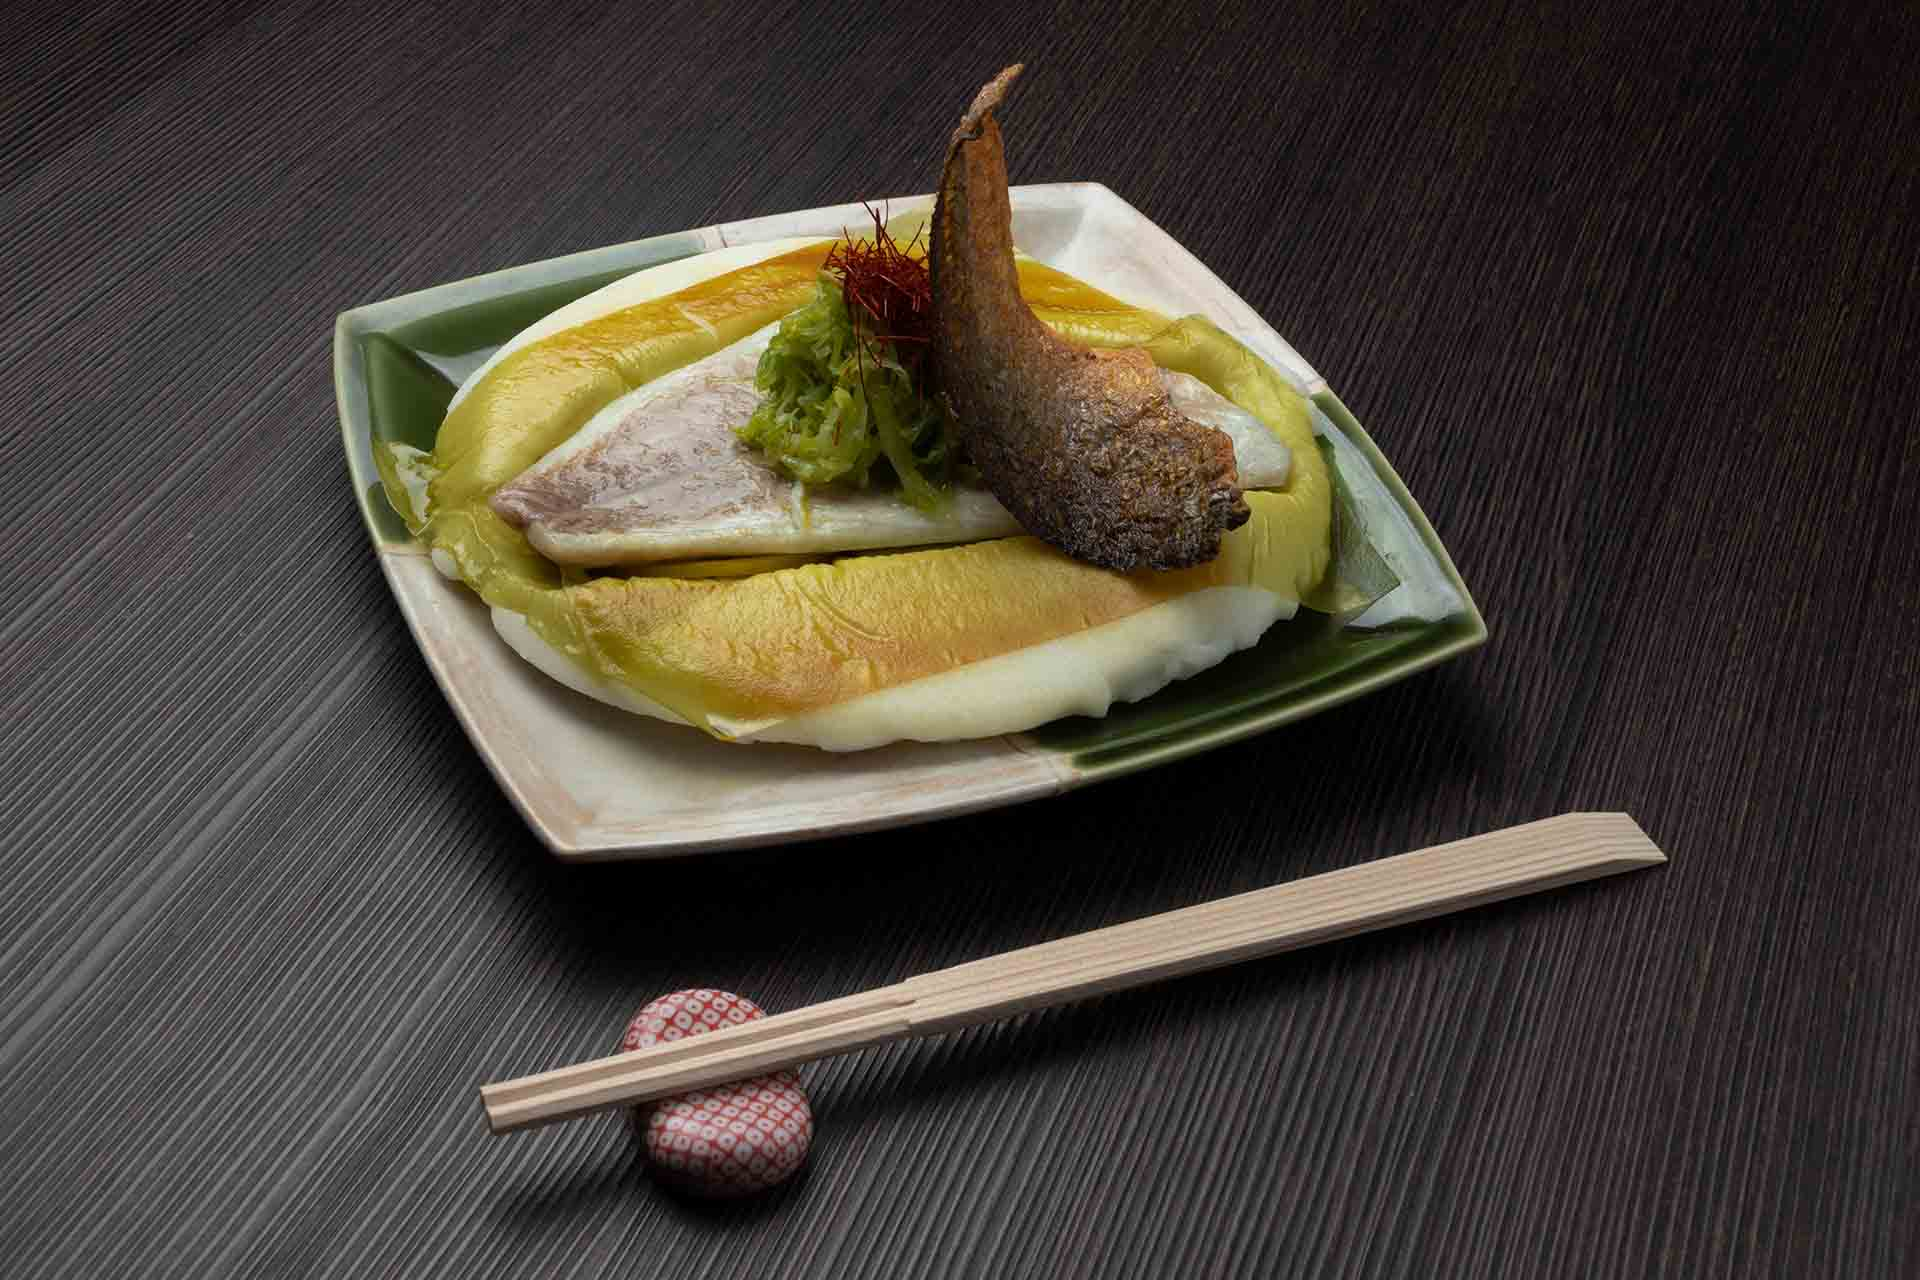 Sazanka's fish